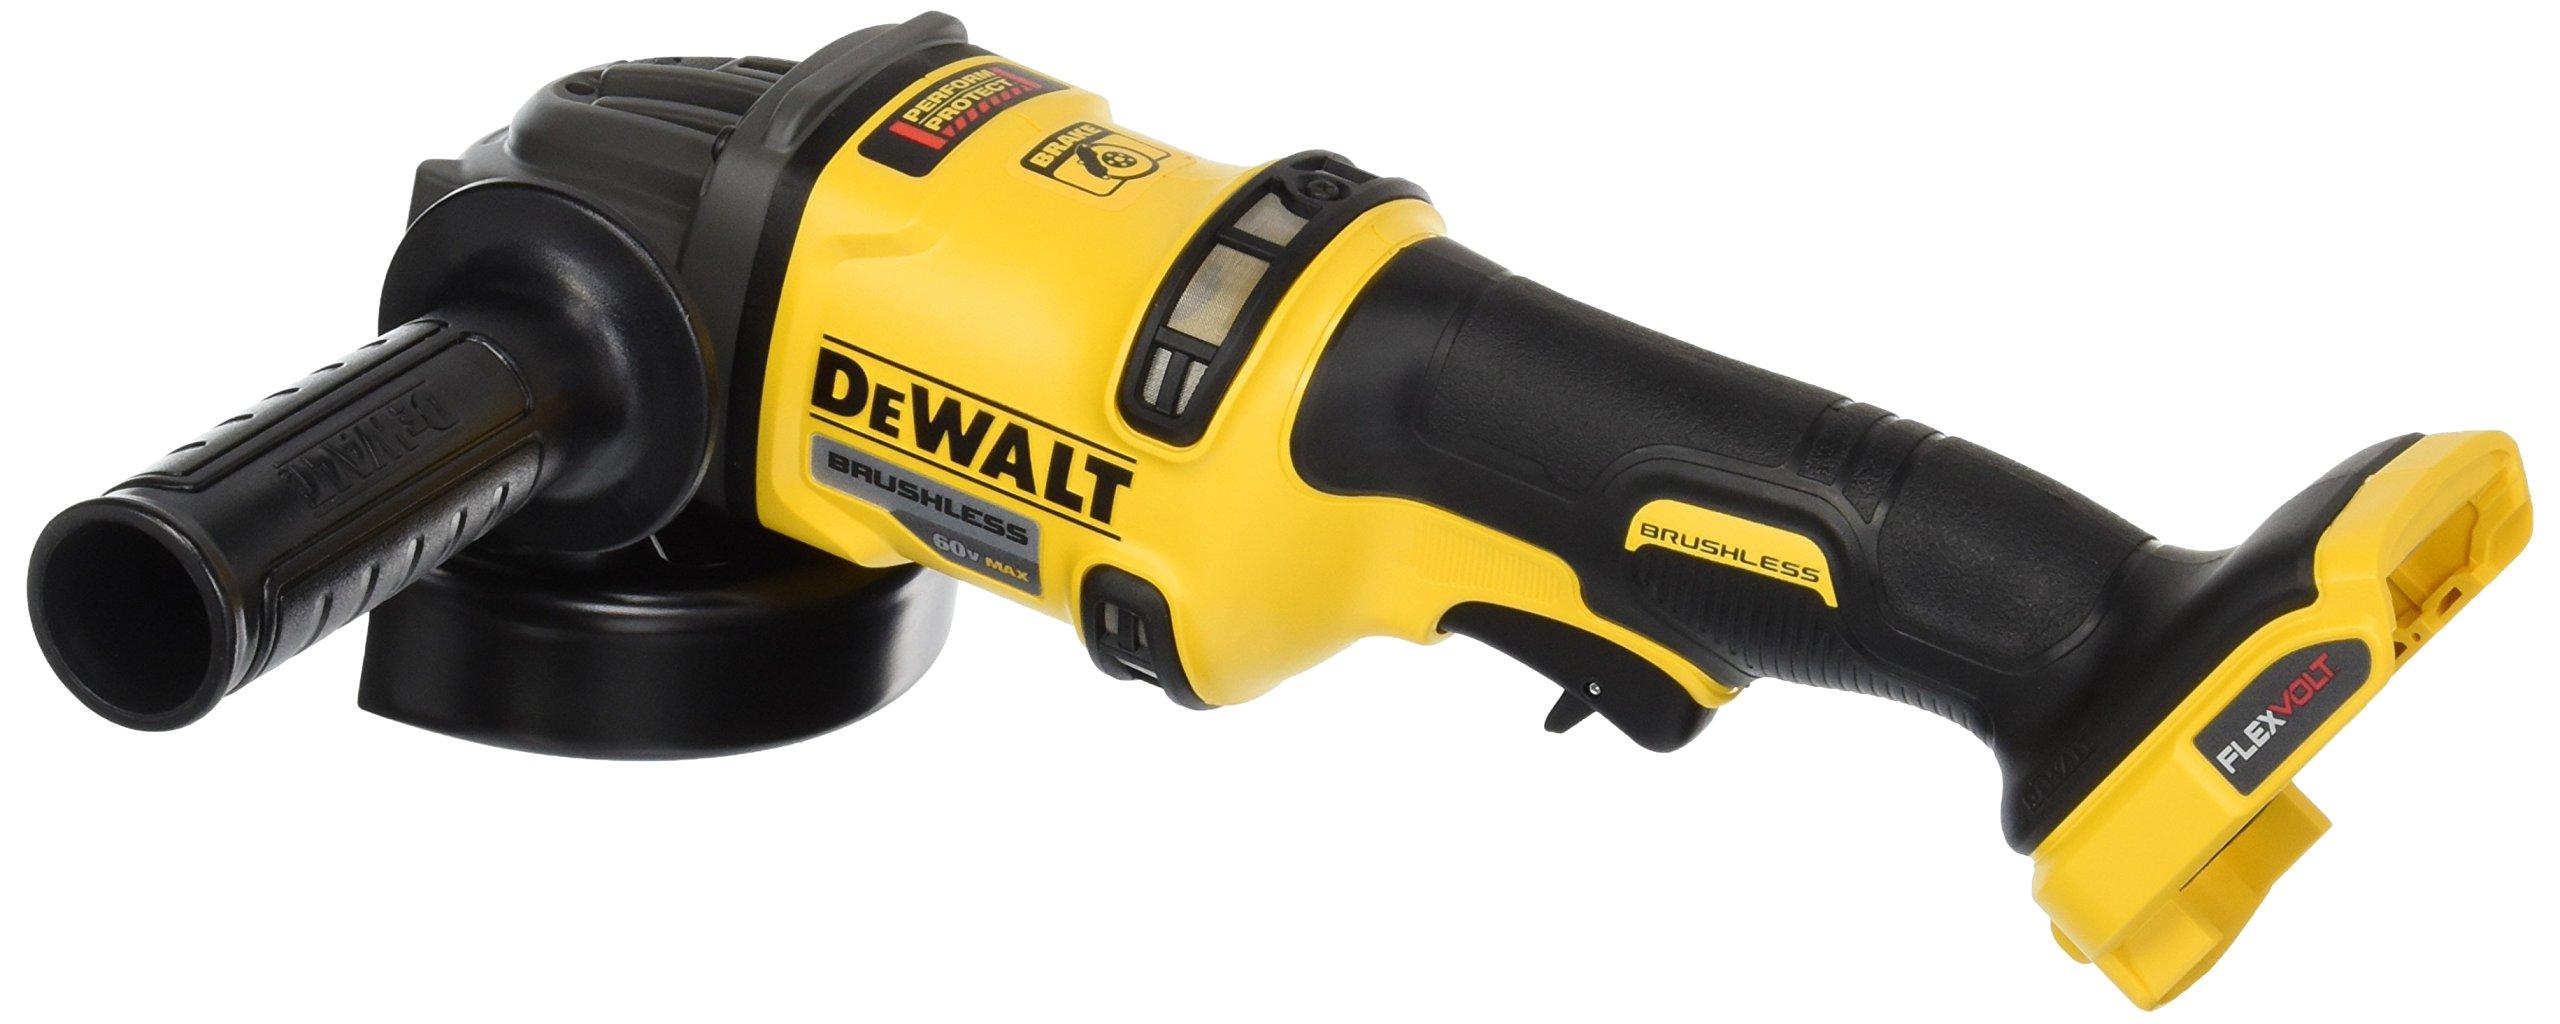 DEWALT DCG414B 60V MAX Bare Tool FLEXVOLT Grinder with Kickback Brake